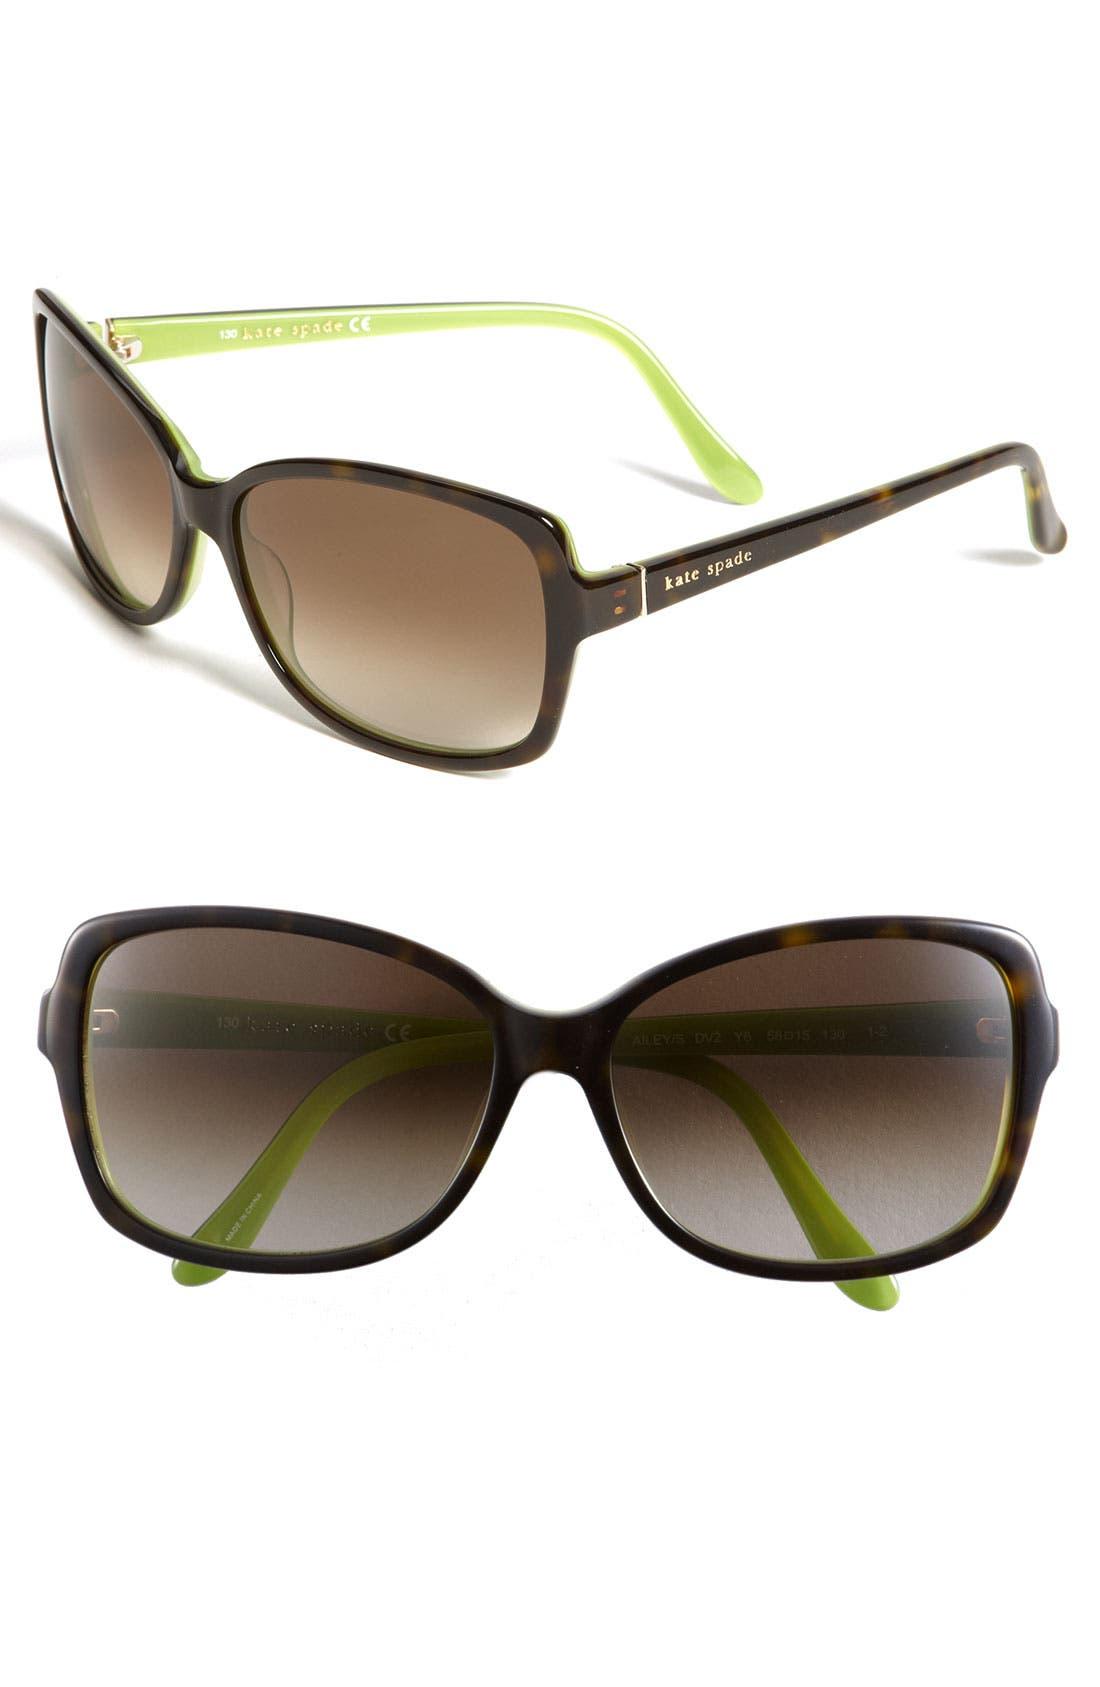 58mm two-tone sunglasses,                         Main,                         color, Tortoise Kiwi